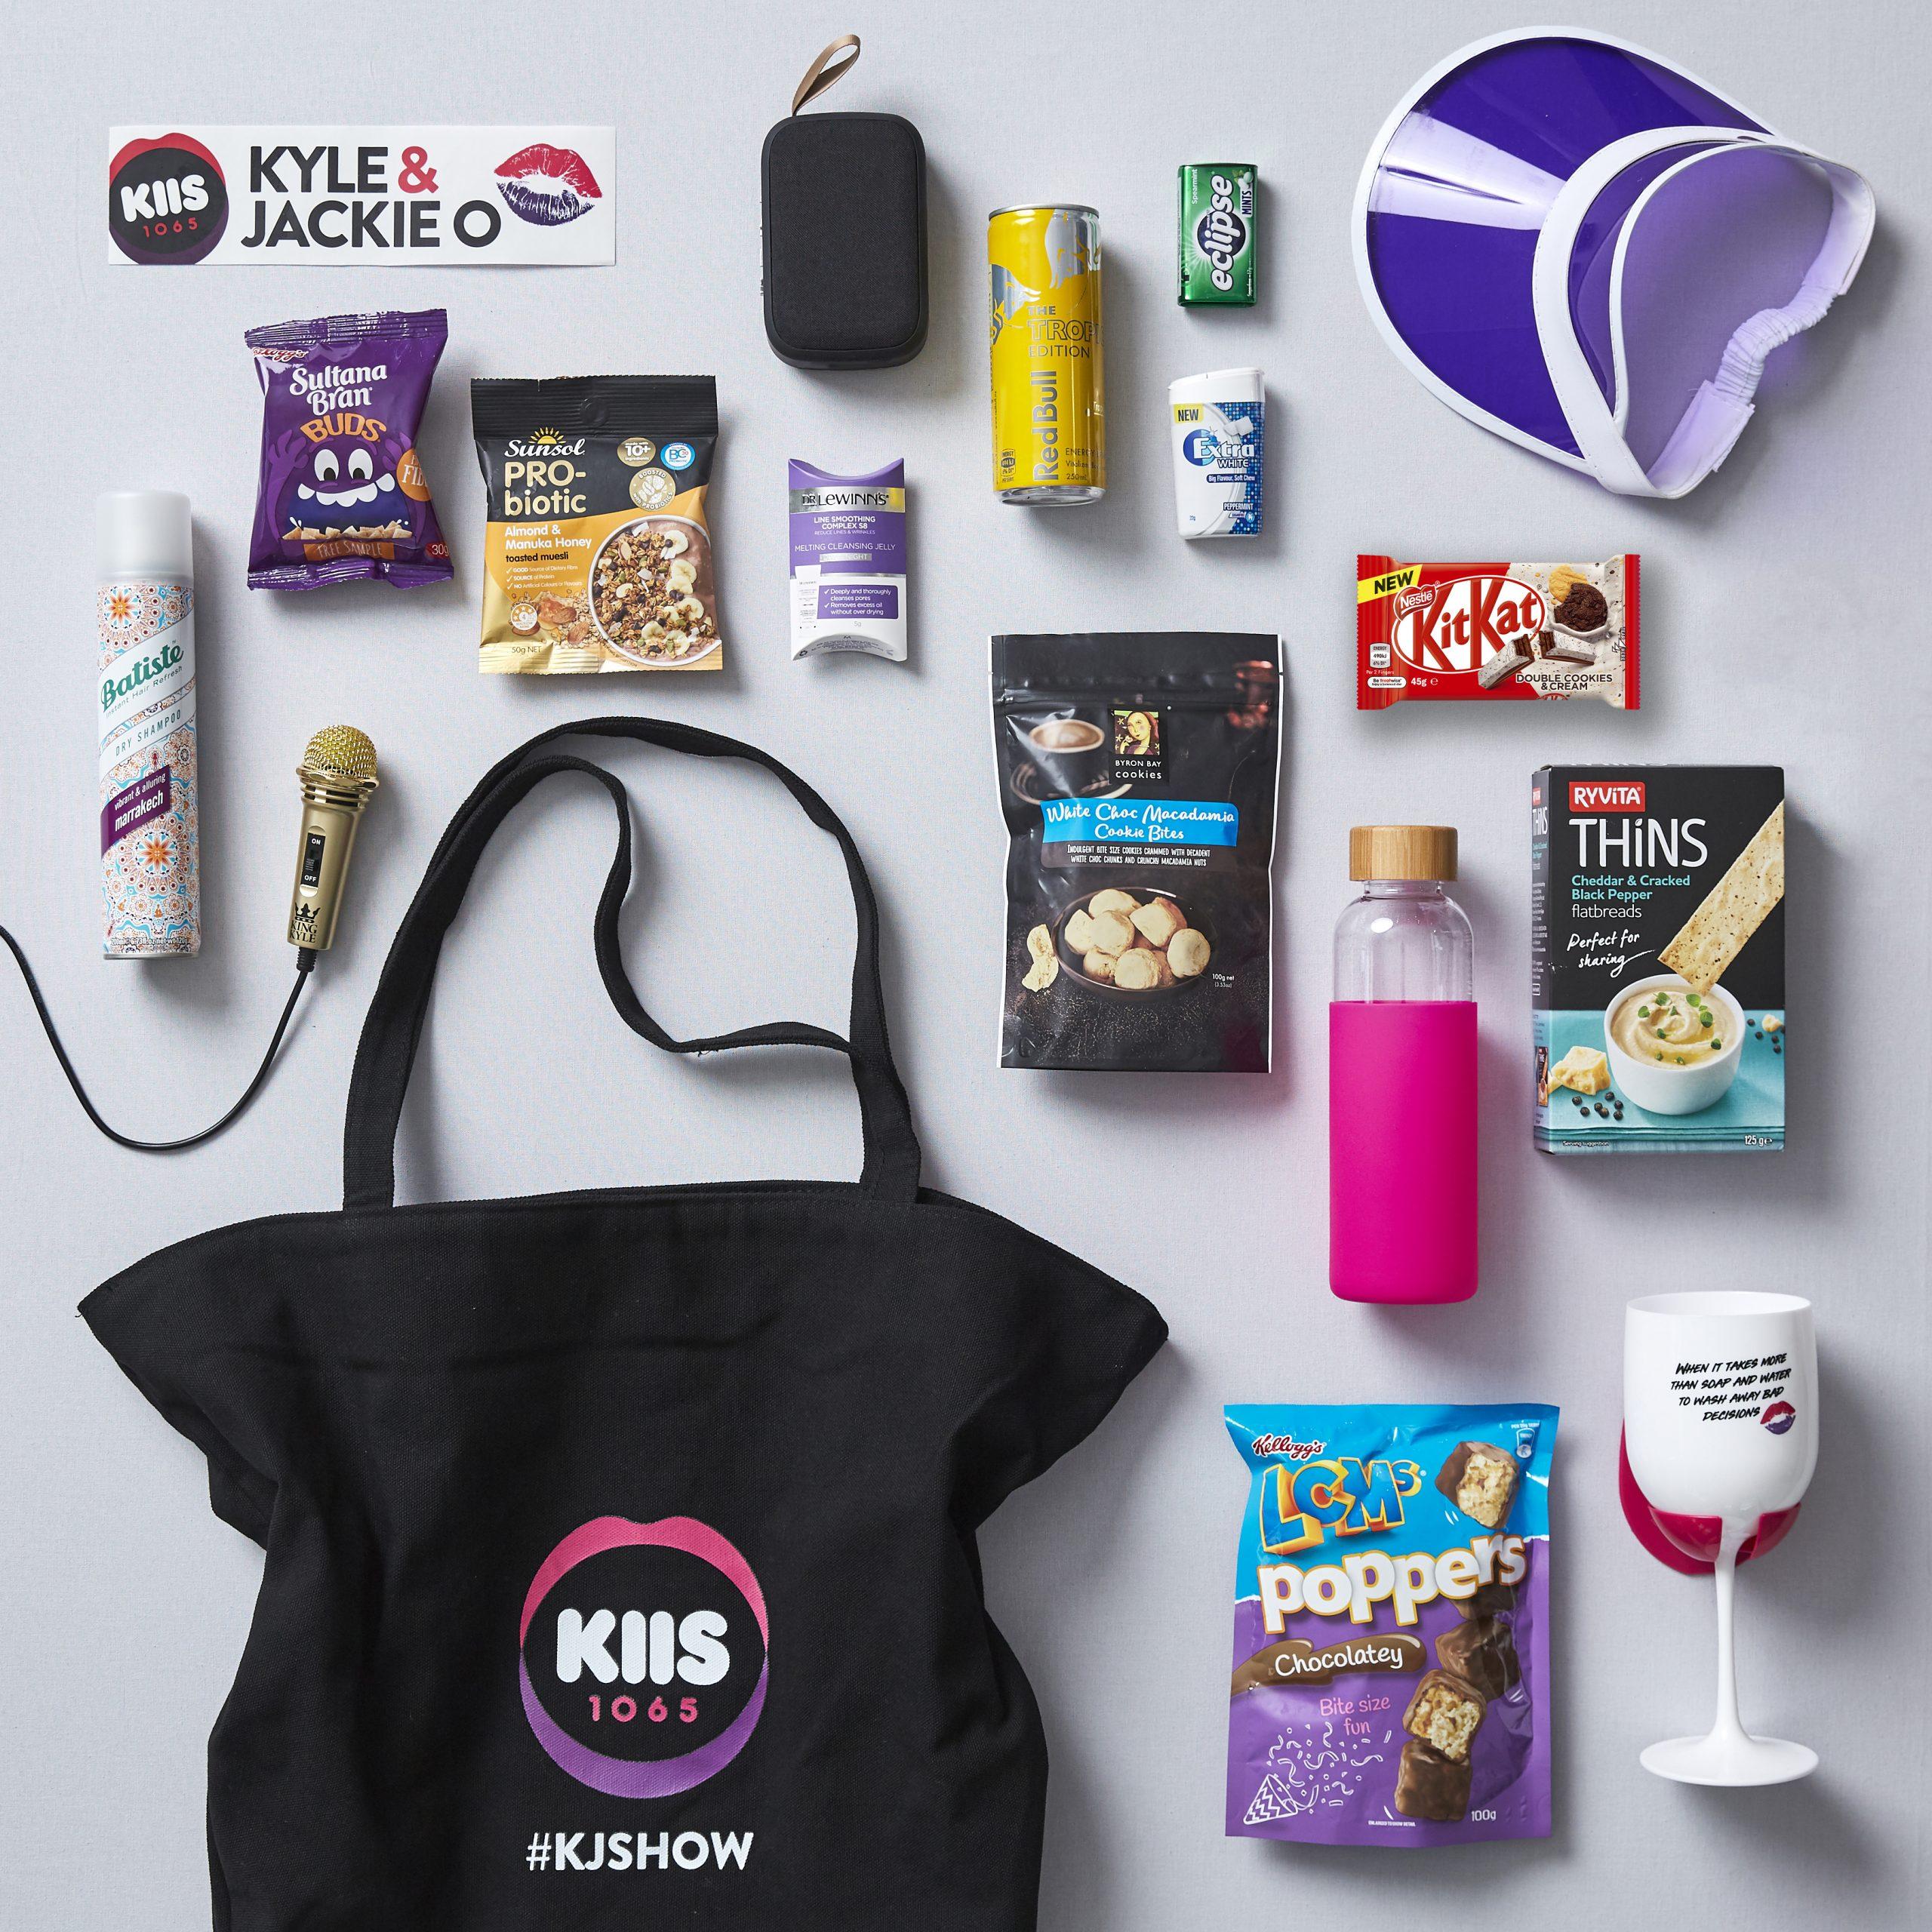 KIIS_Sydney_2020_NoLogoSpeaker_KitKat